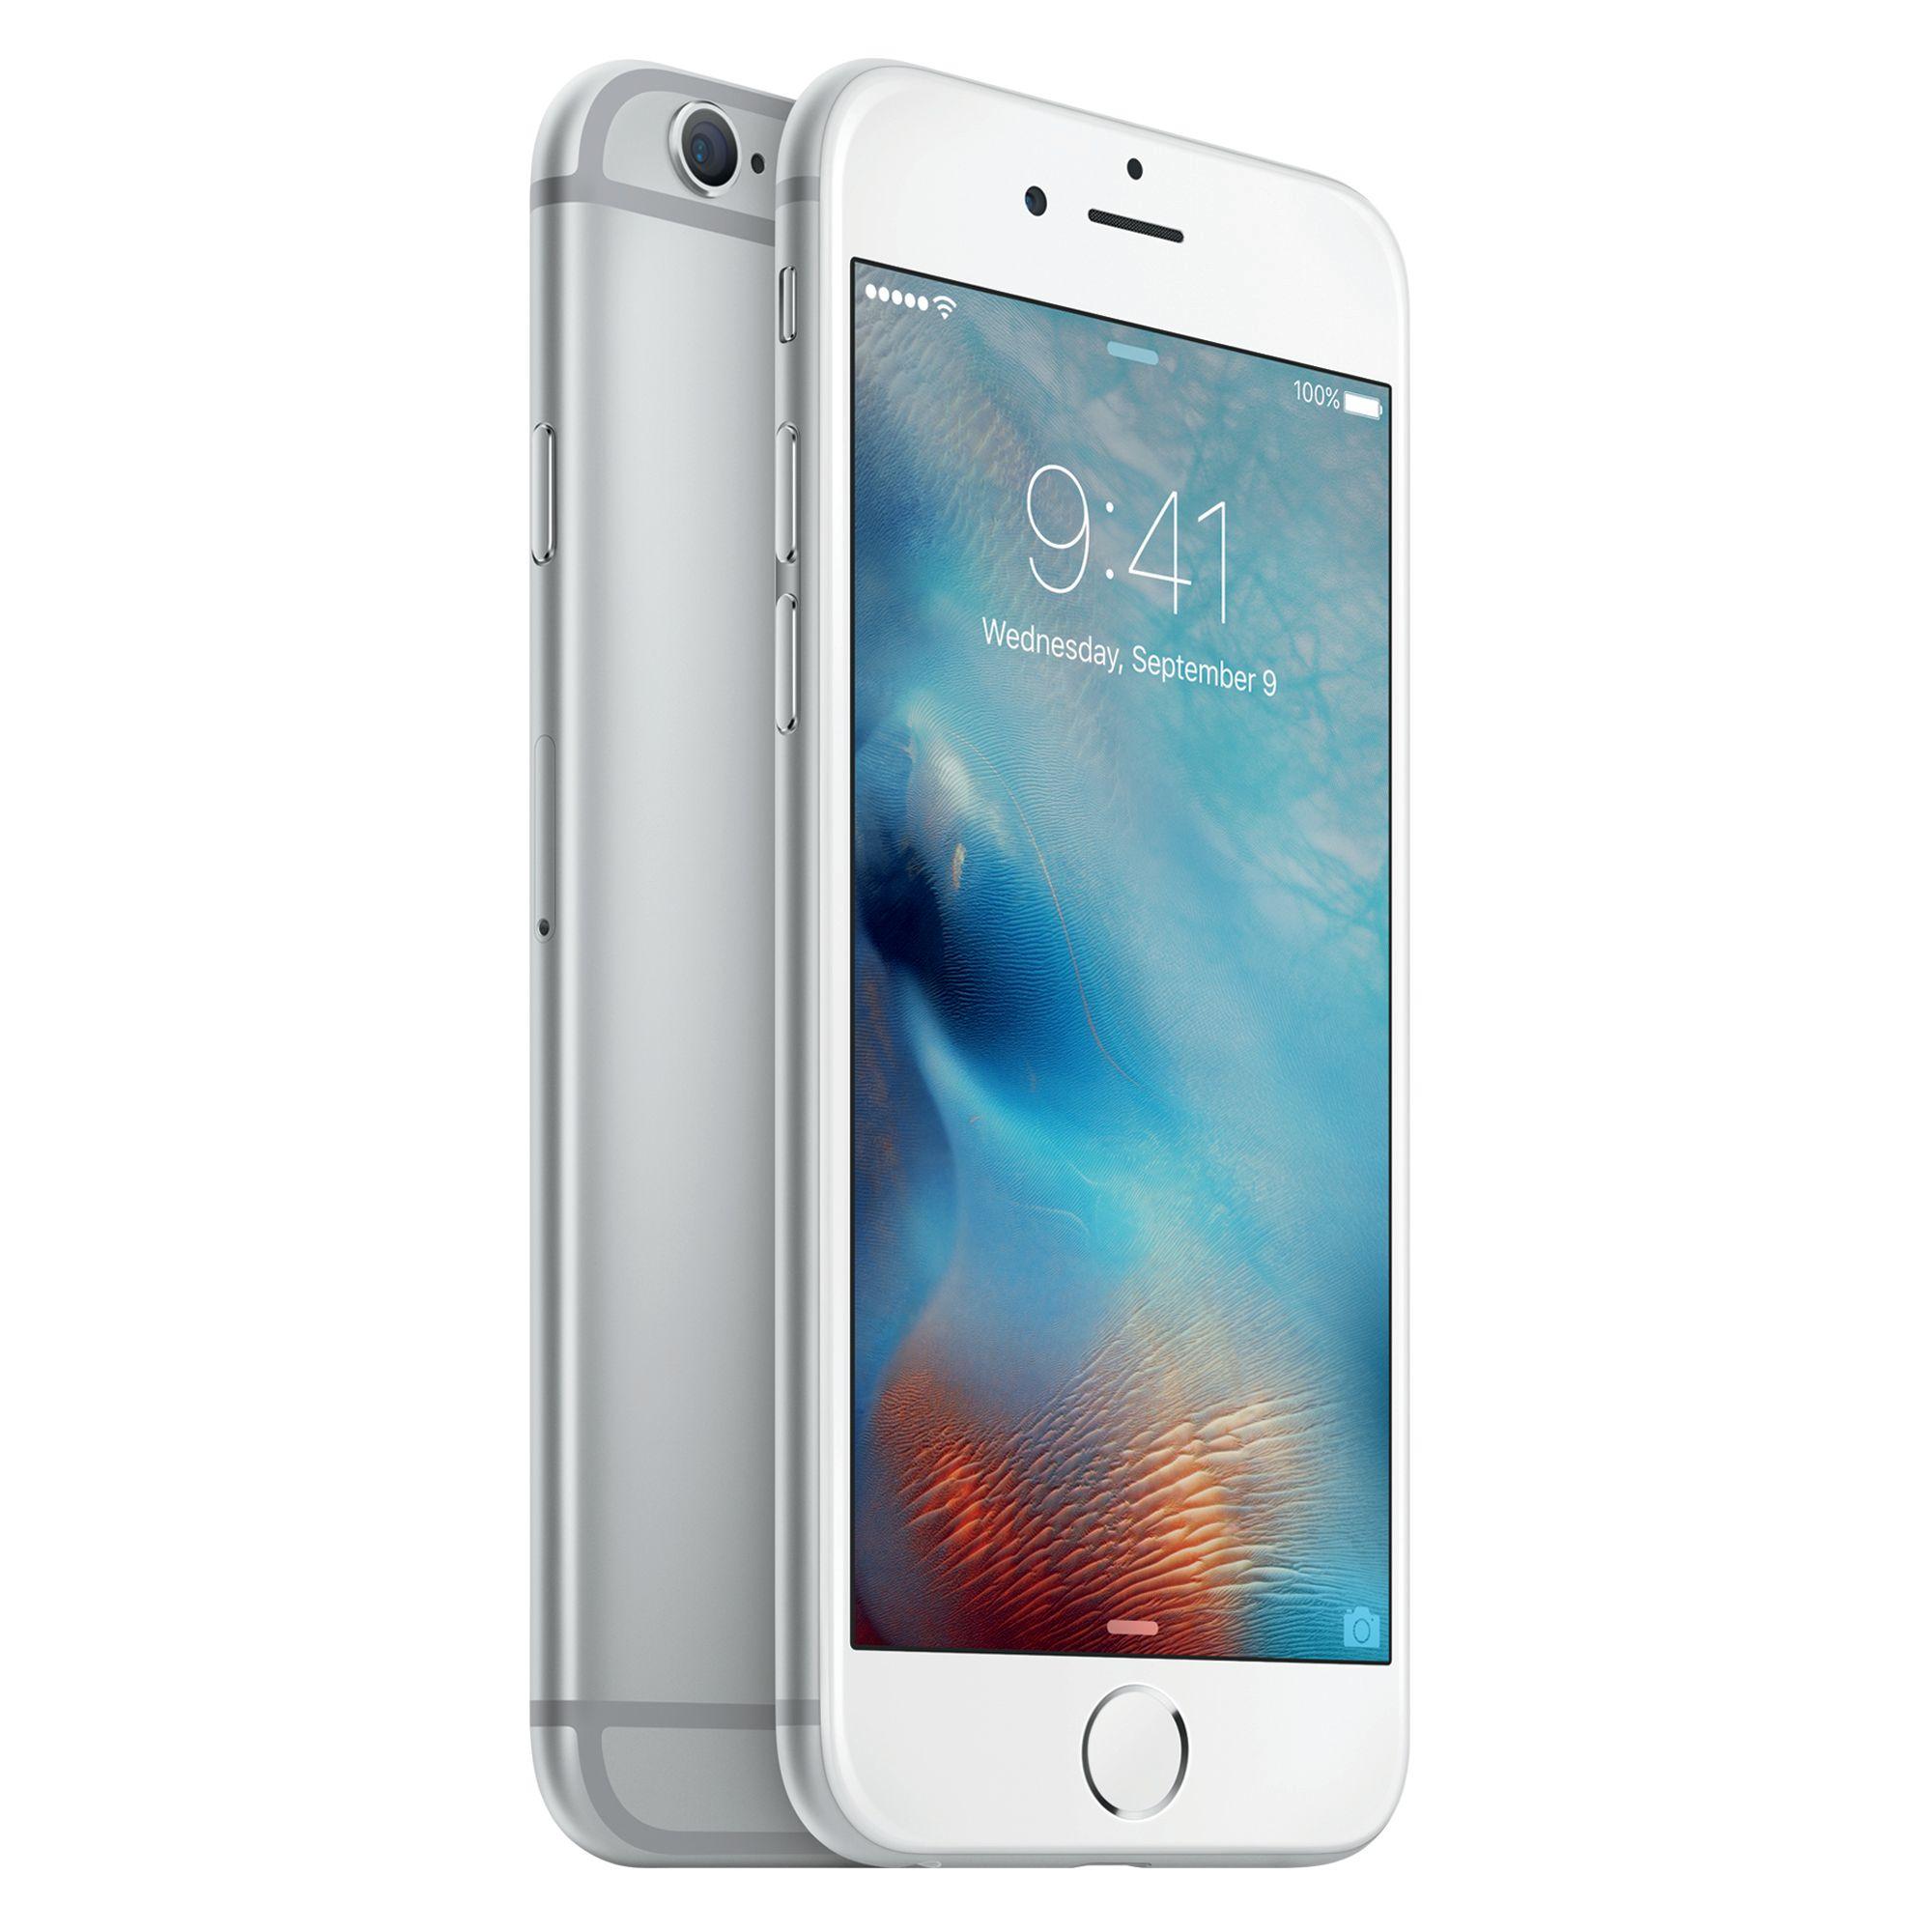 Refurbished Apple iPhone 6 Plus 16GB, Silver - Straight Talk